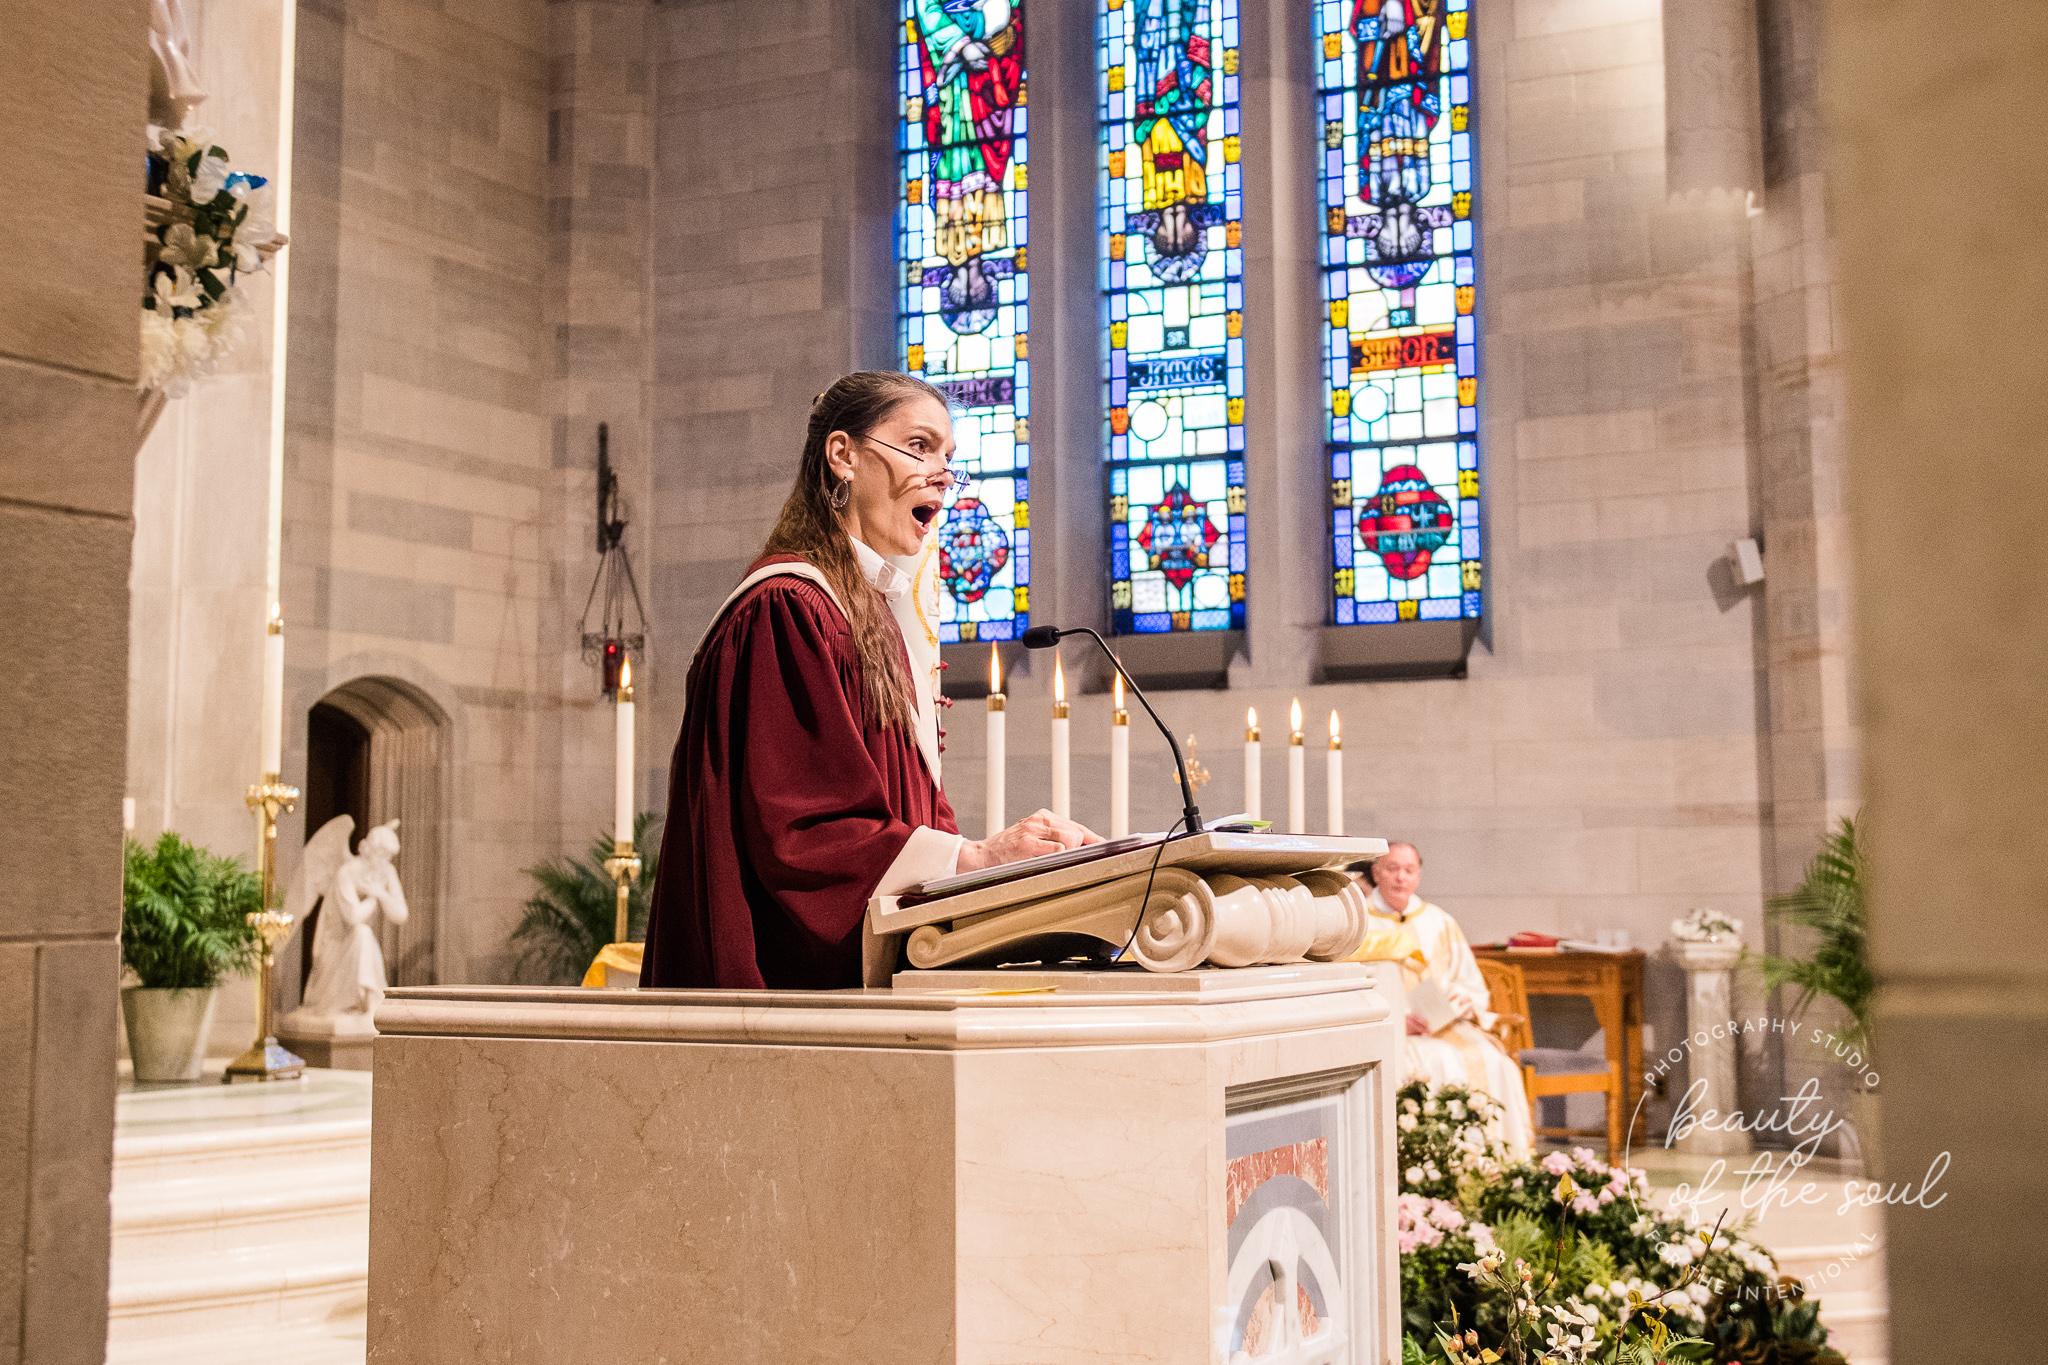 washington-dc-st-ann-catholic-church-first-holy-communion-beauty-of-the-soul-studio-may-2019-05.jpg